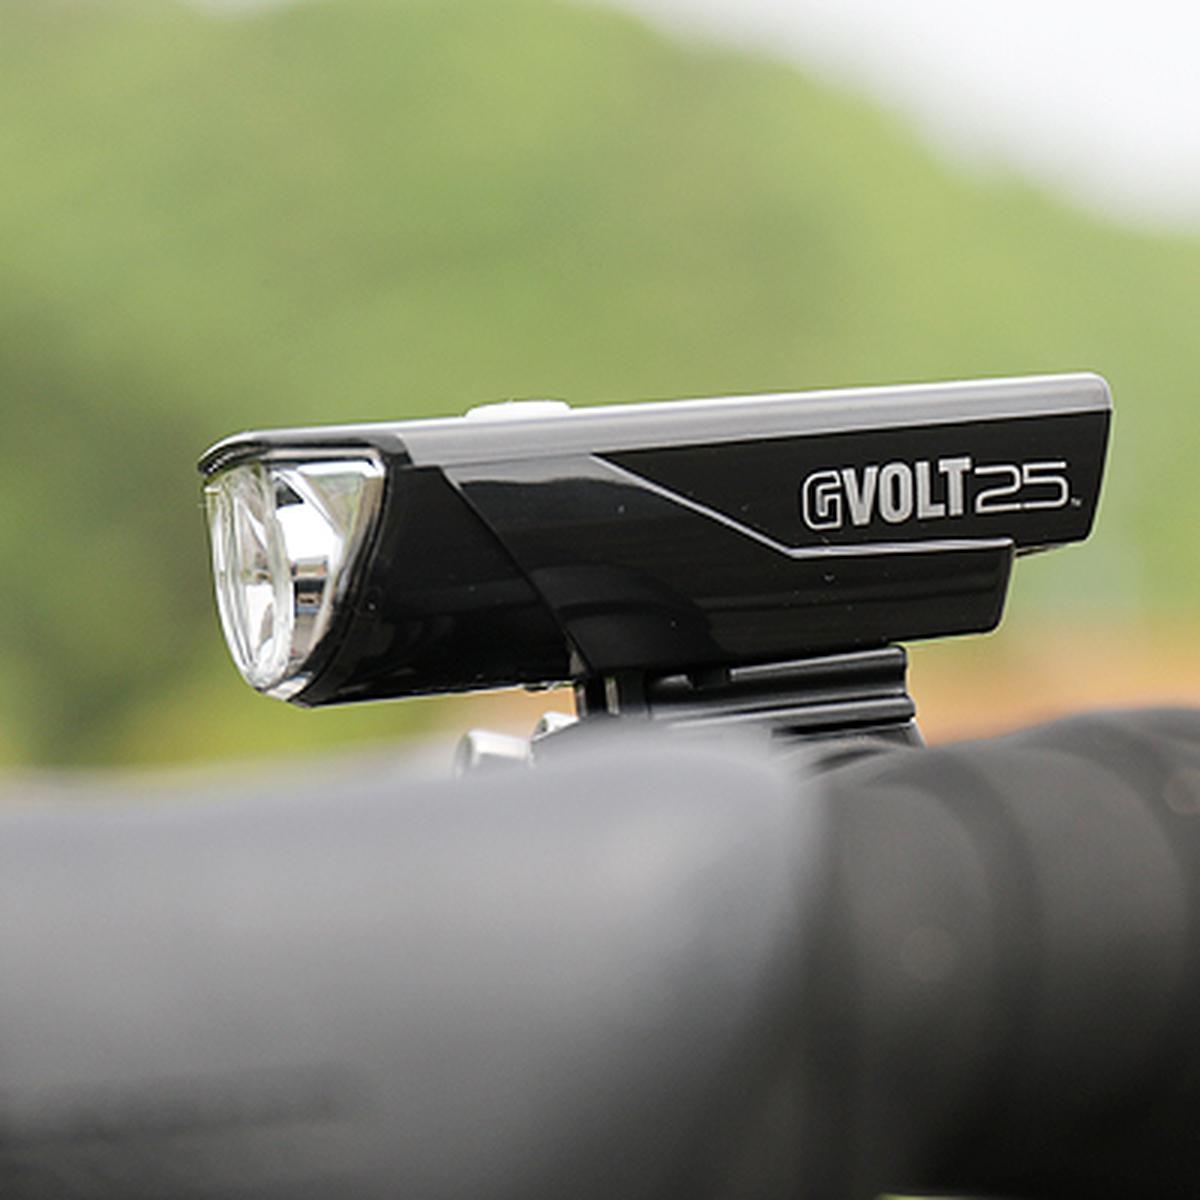 Cat Eye GVolt 25 StVZO frontlys